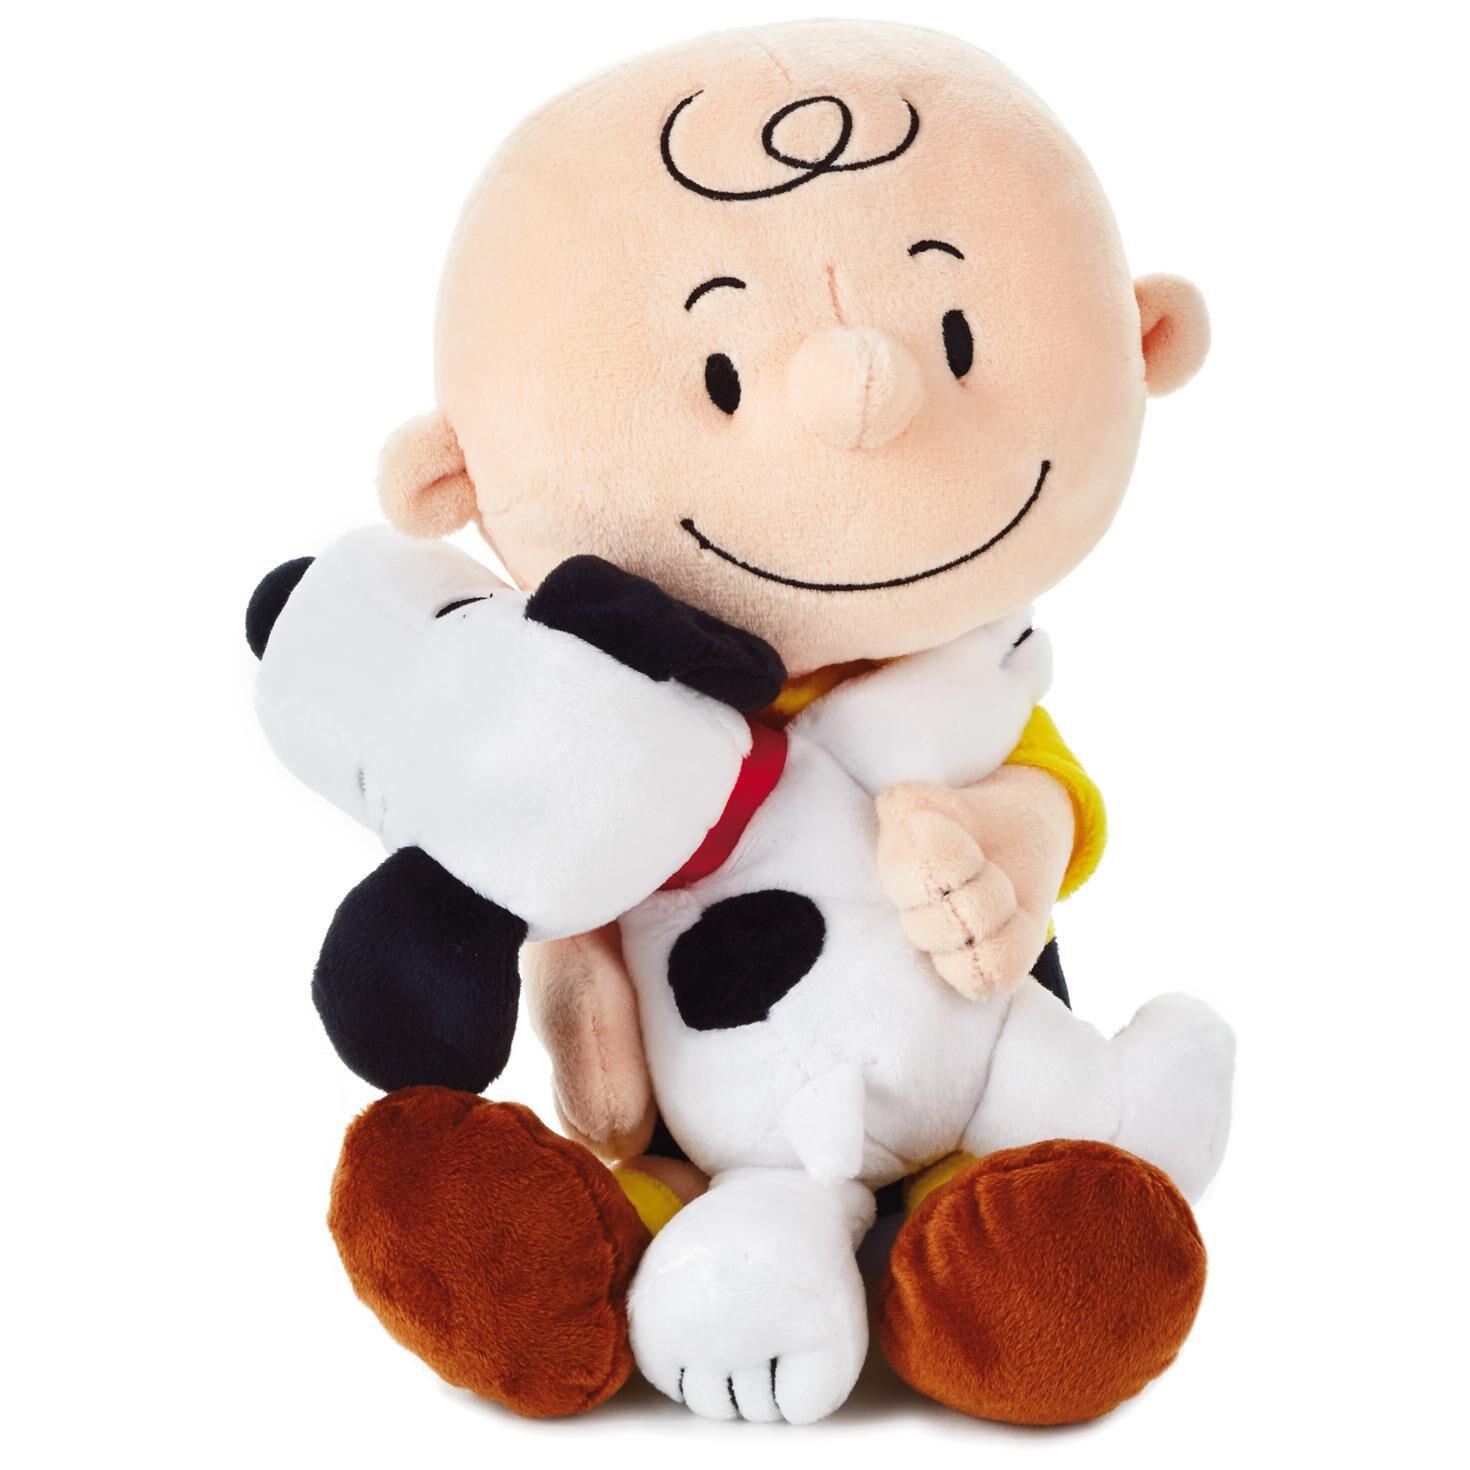 Peanuts® Charlie Brown and Snoopy Hugging Stuffed Animal, 8 75